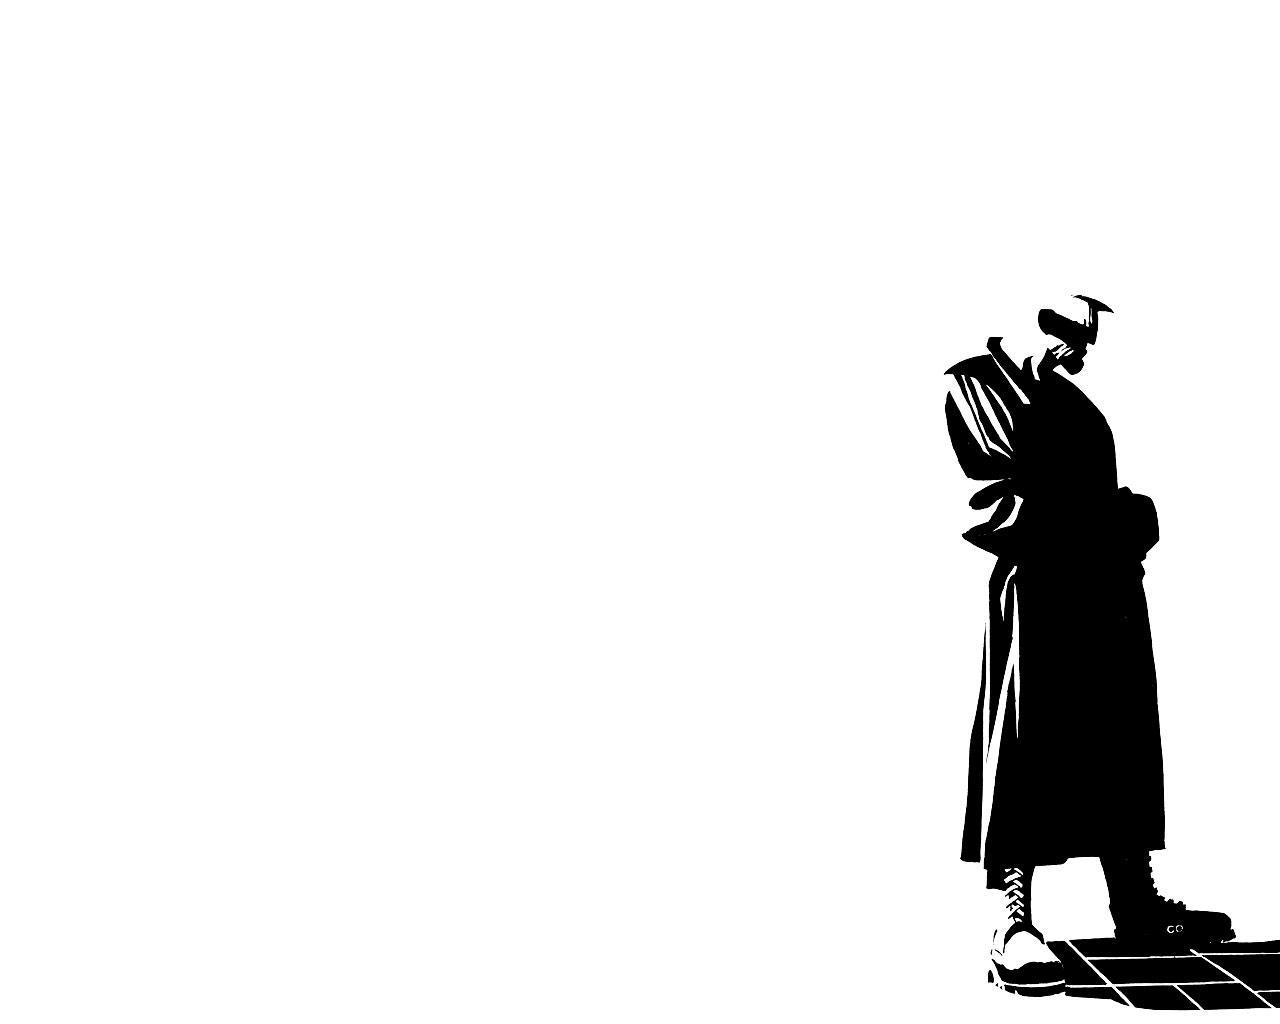 Sin City - Frank Miller - Thug by sidkowalski on DeviantArt